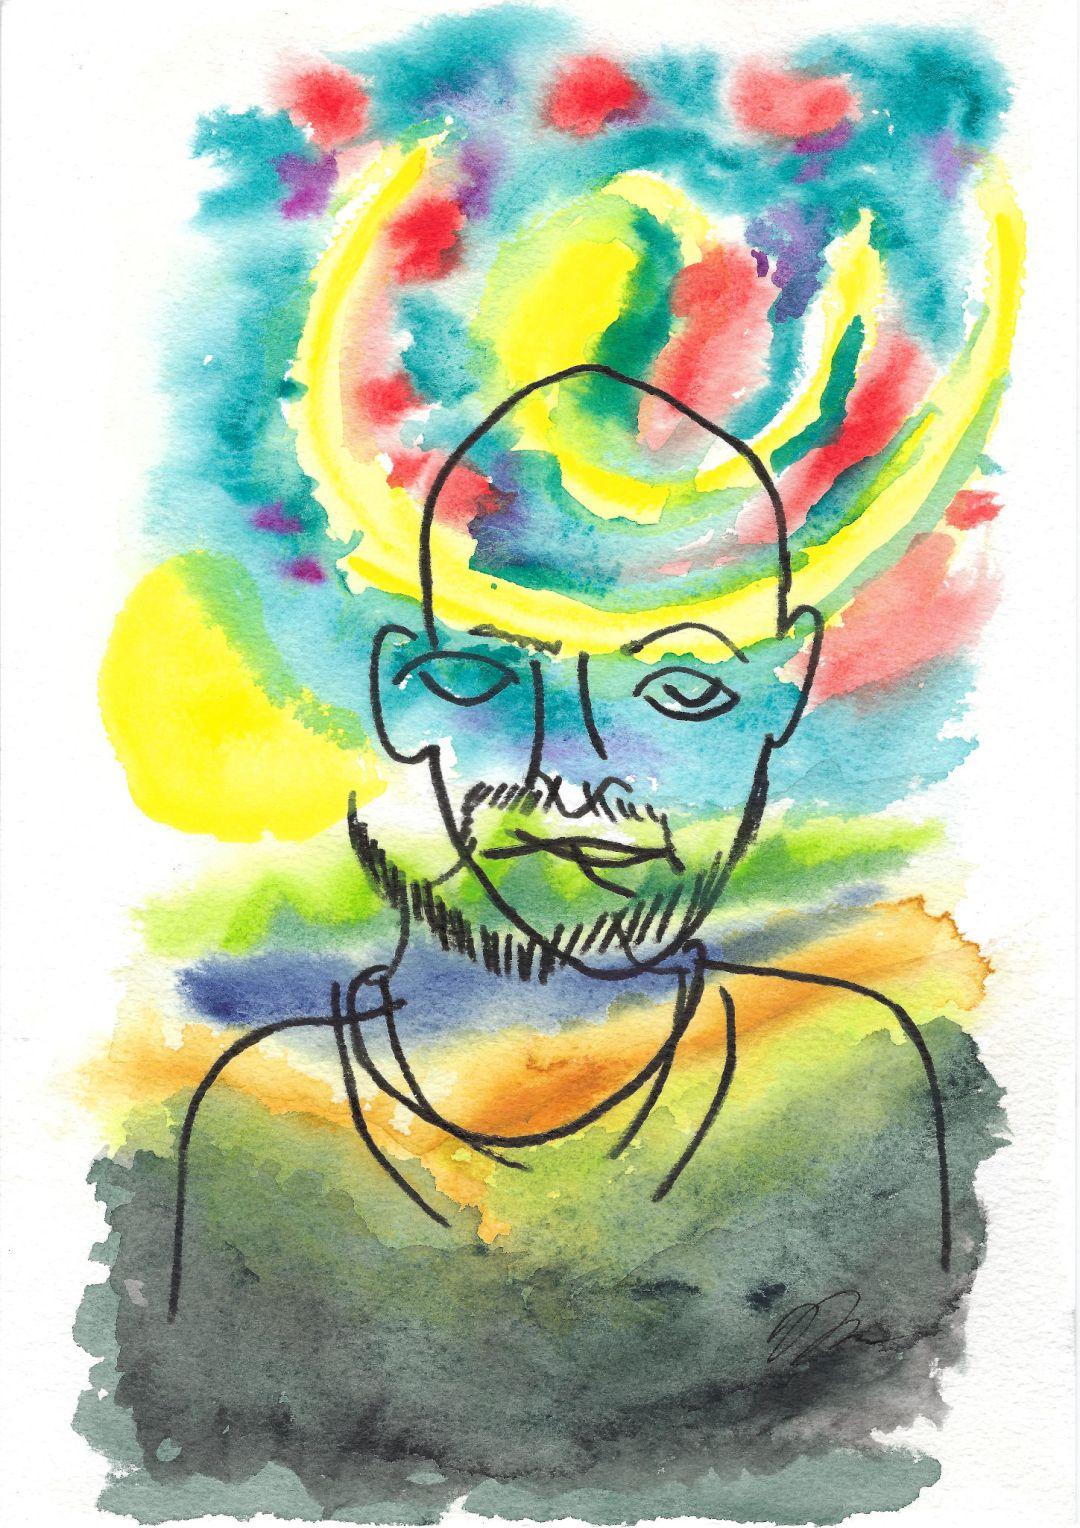 Contour line drawing of blind self portrait.